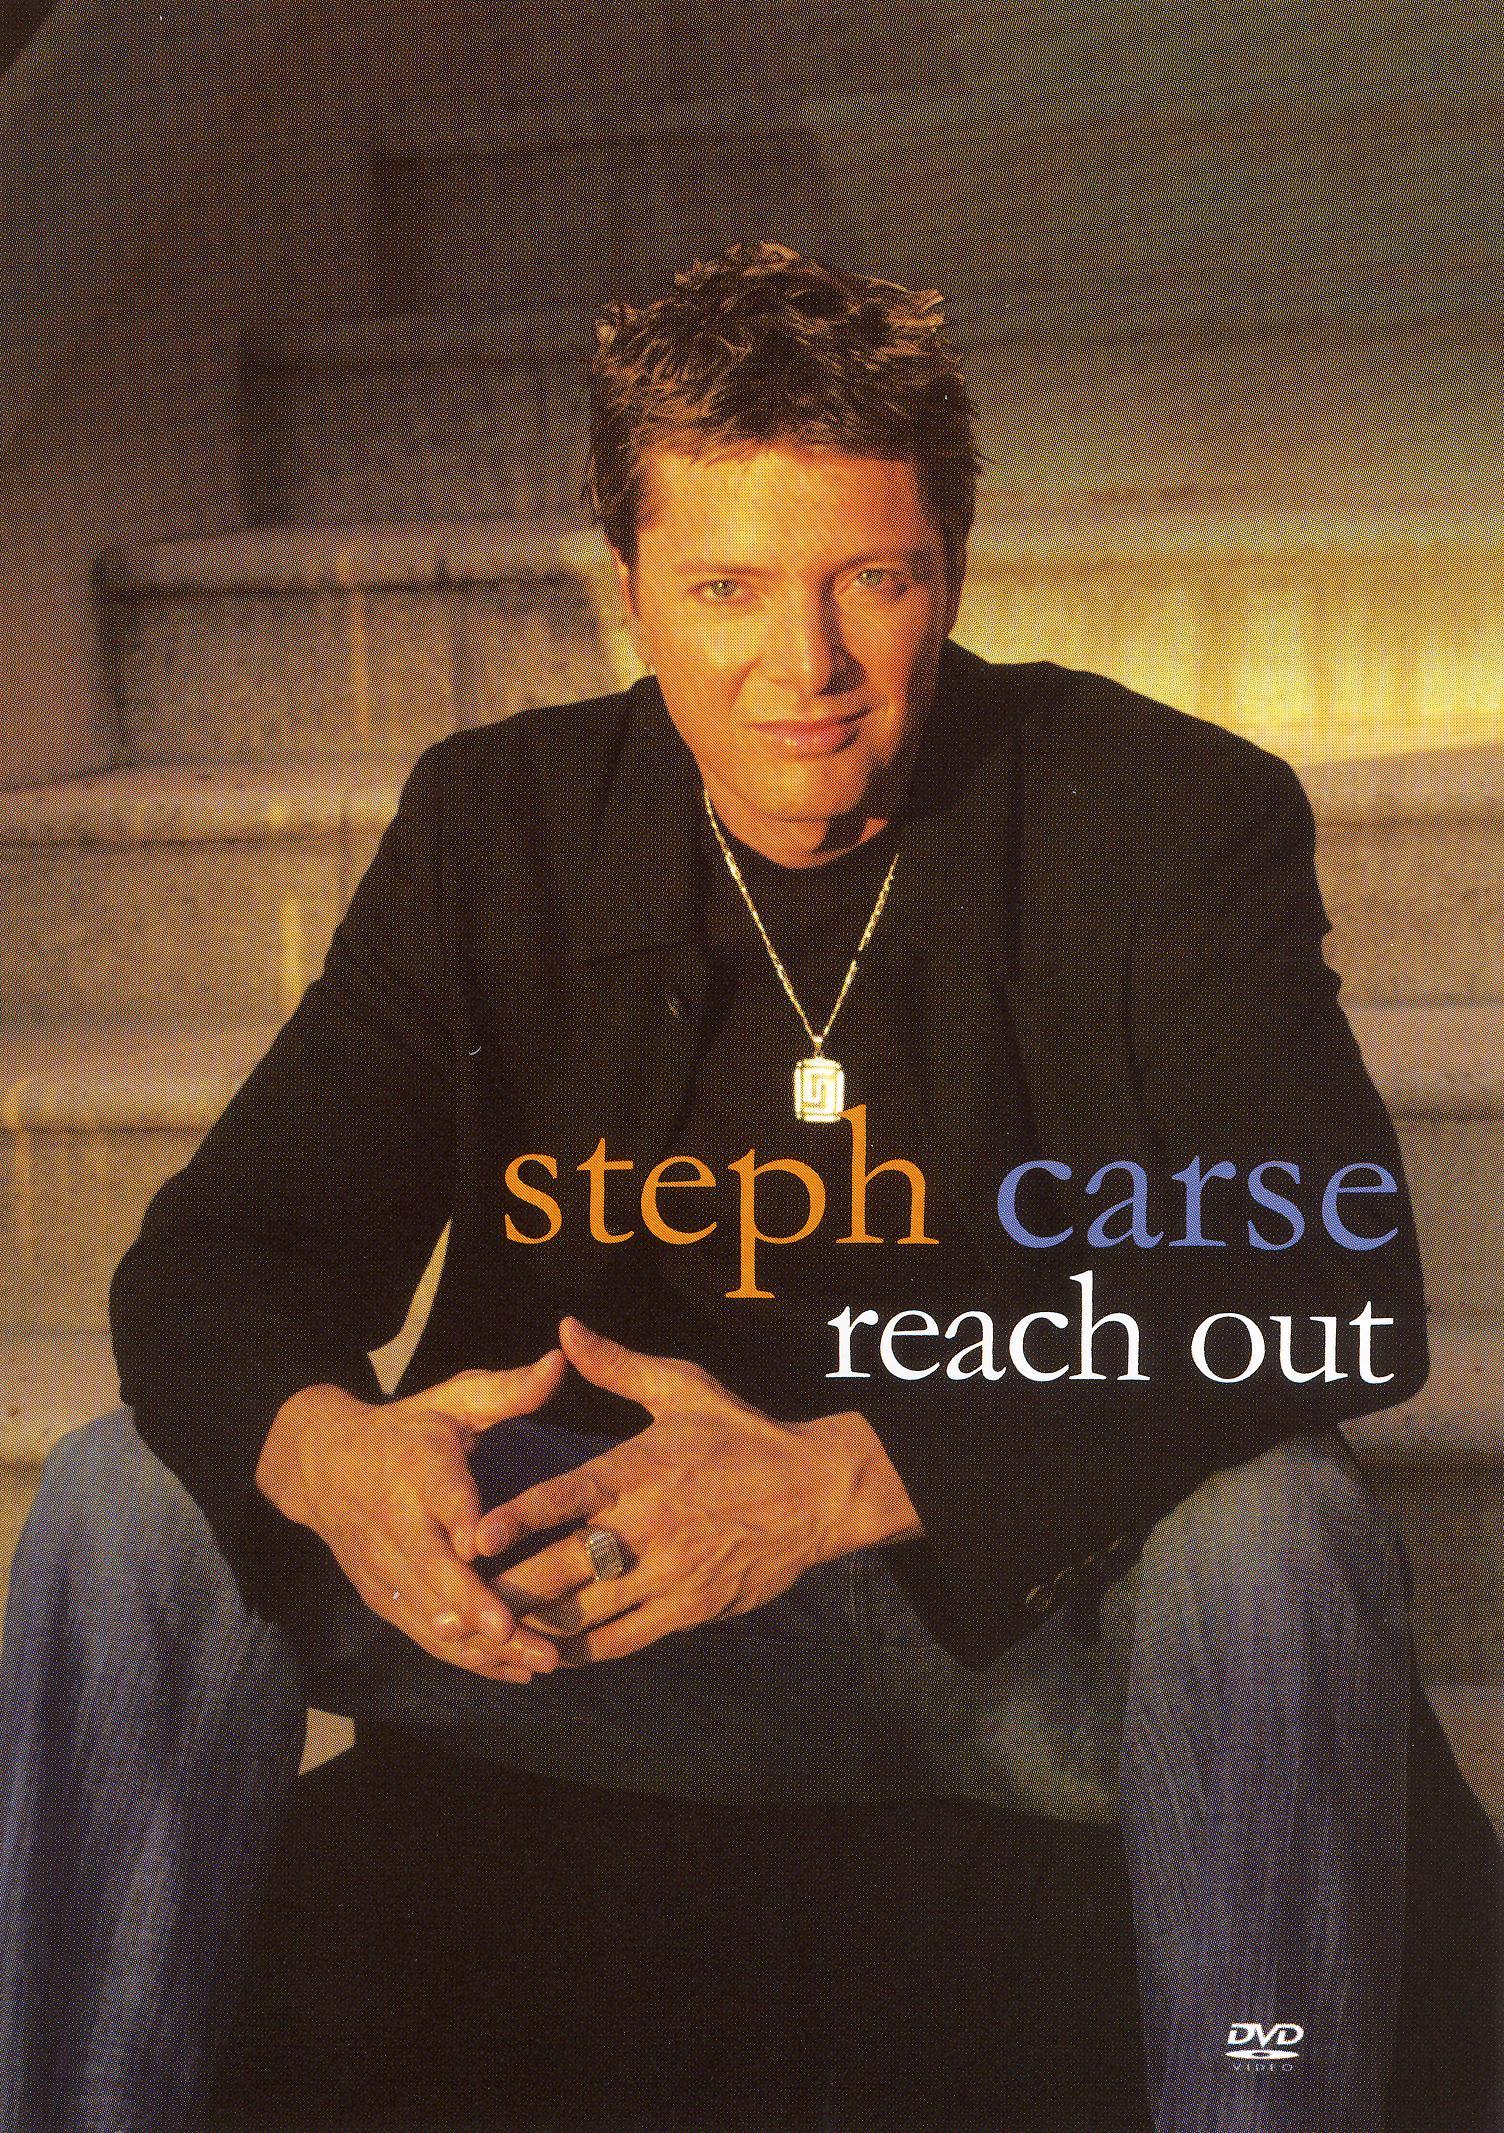 Steph Carse: Reach Out